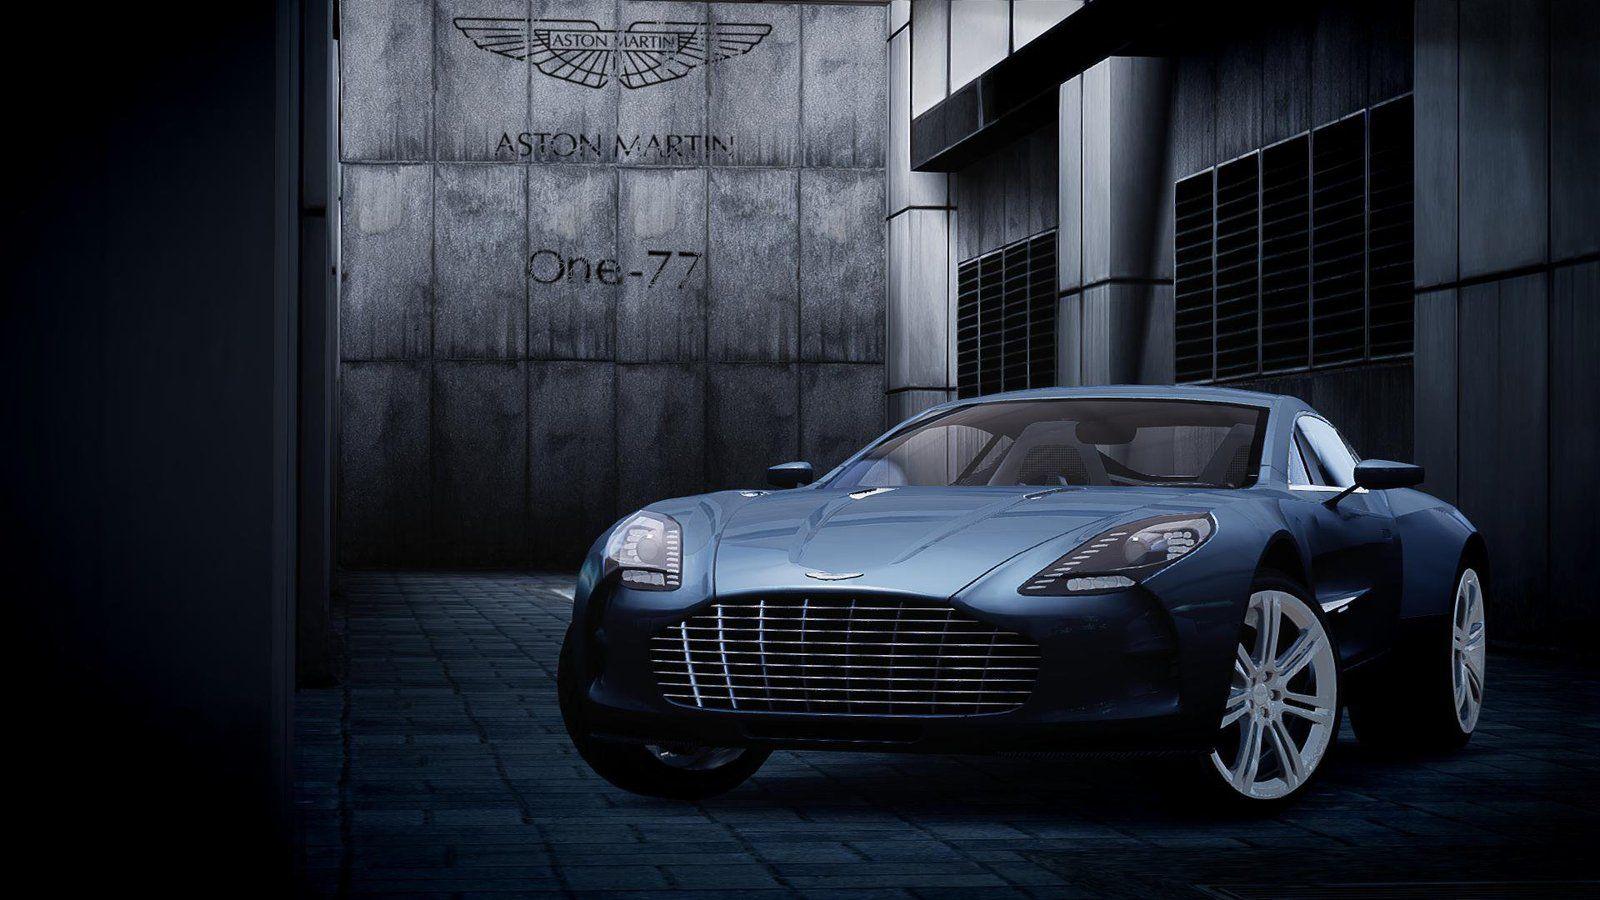 aston martin vanquish wallpaper images #0cw | cars | pinterest